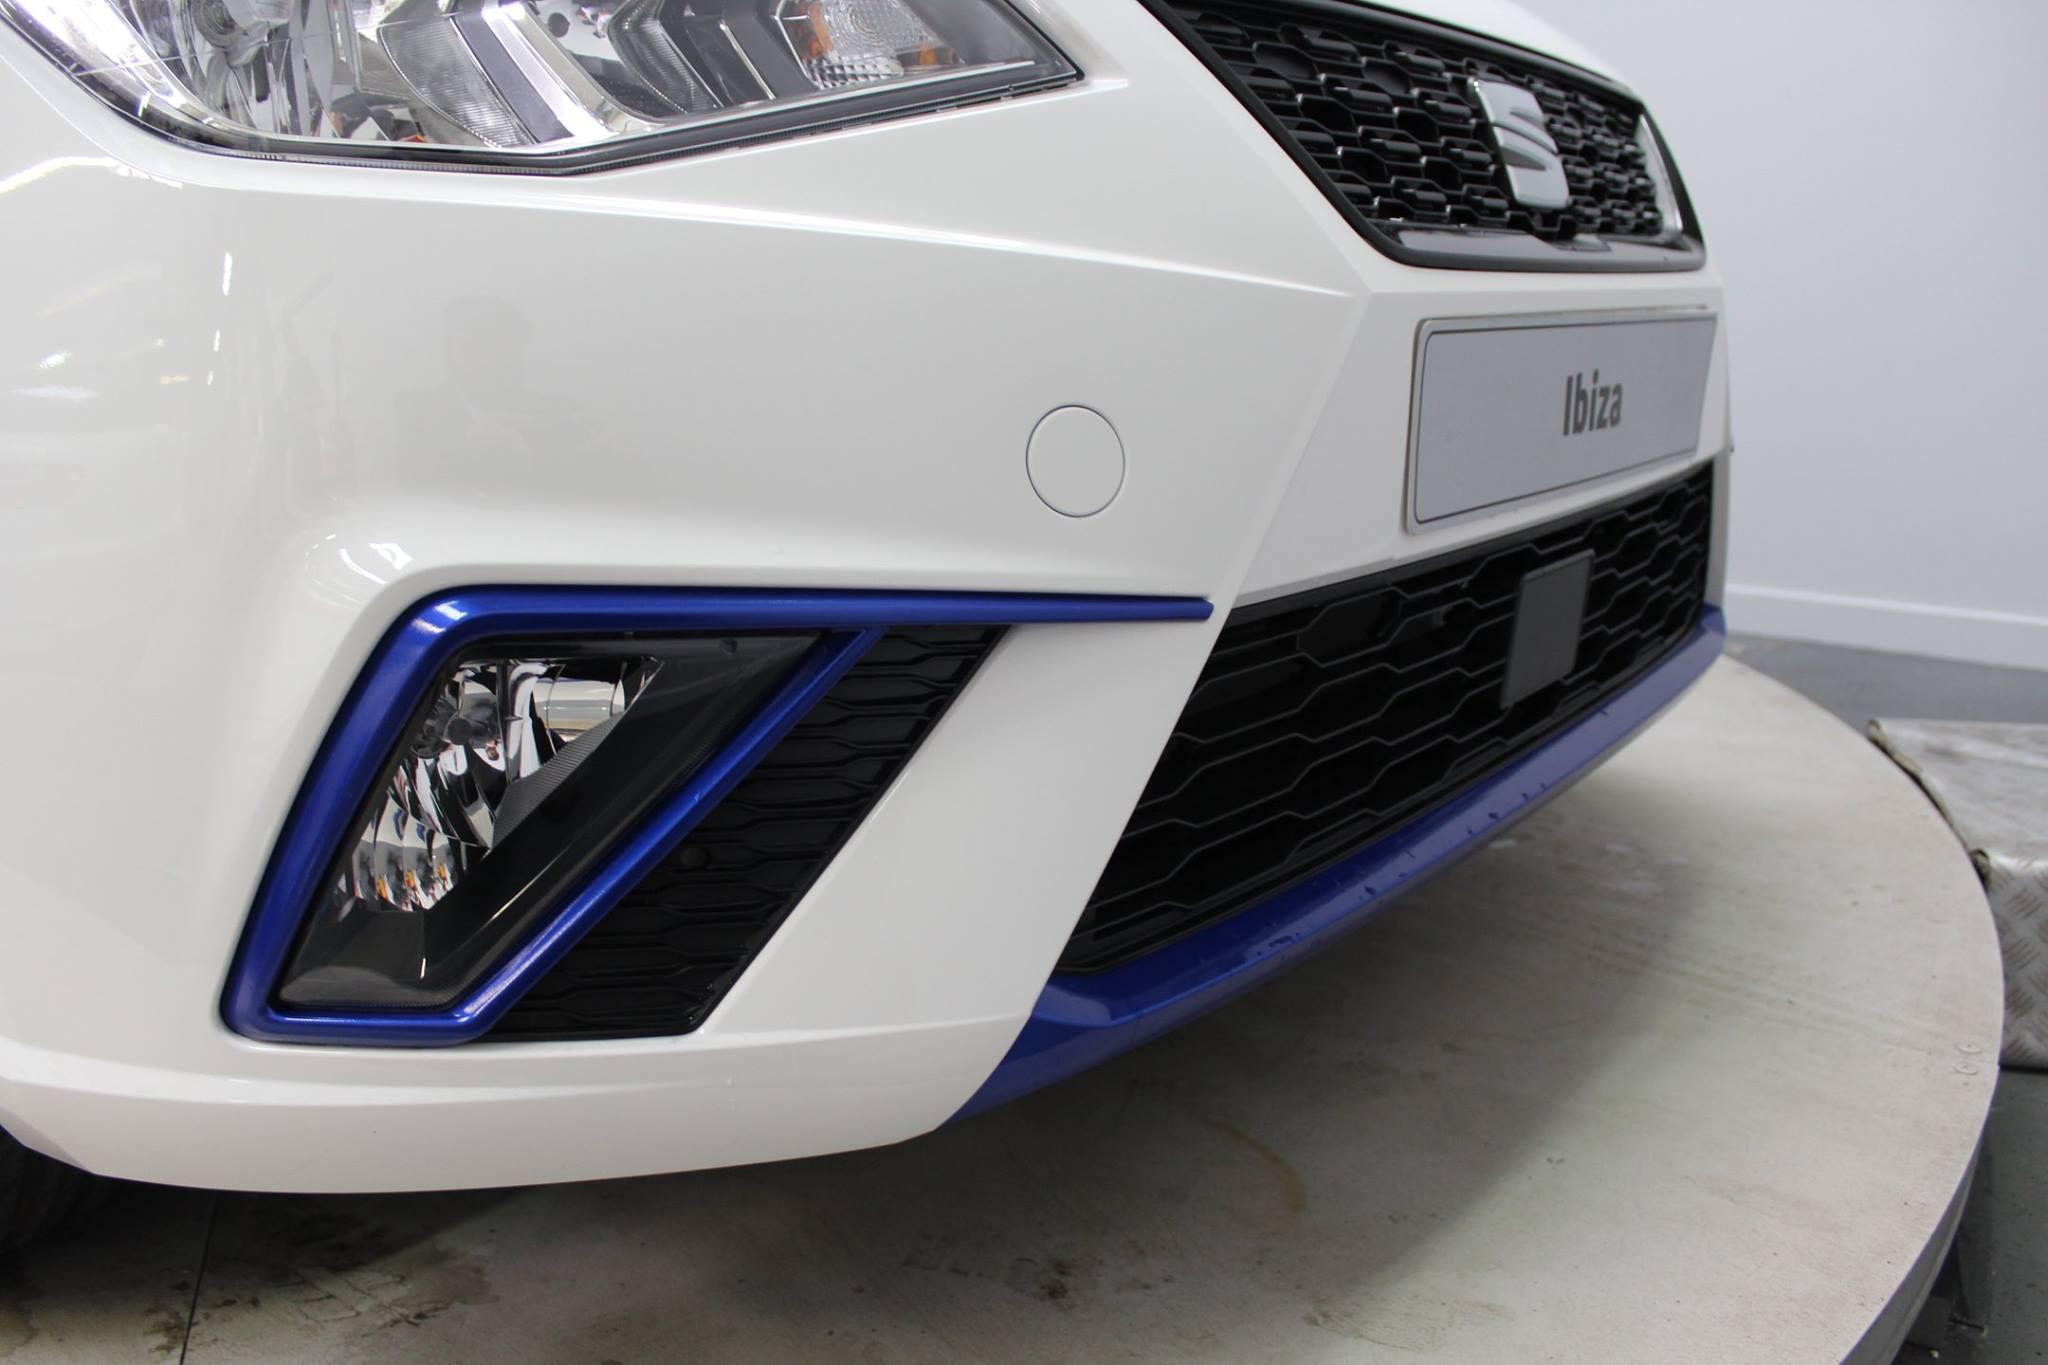 Car Bodywork Detailing & Repairs in Lytham, Lancashire